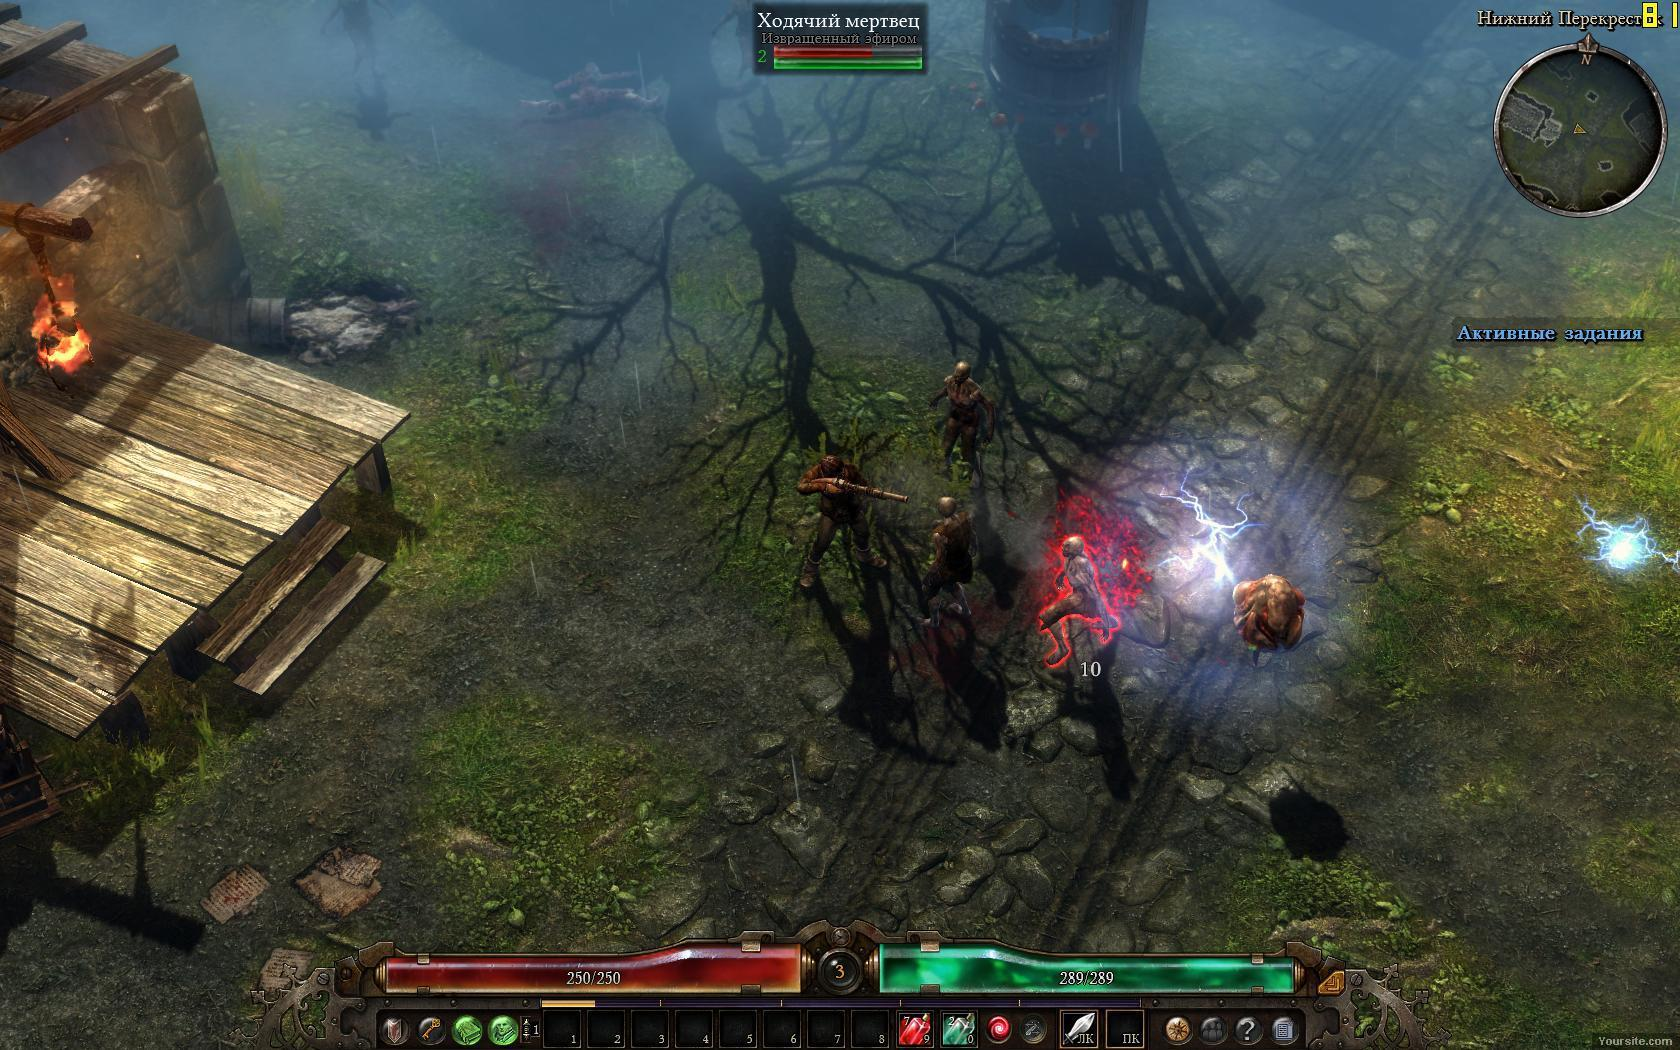 Grim Dawn [v 1.0.3.0 + DLC's] (2016) PC | RePack от xatab